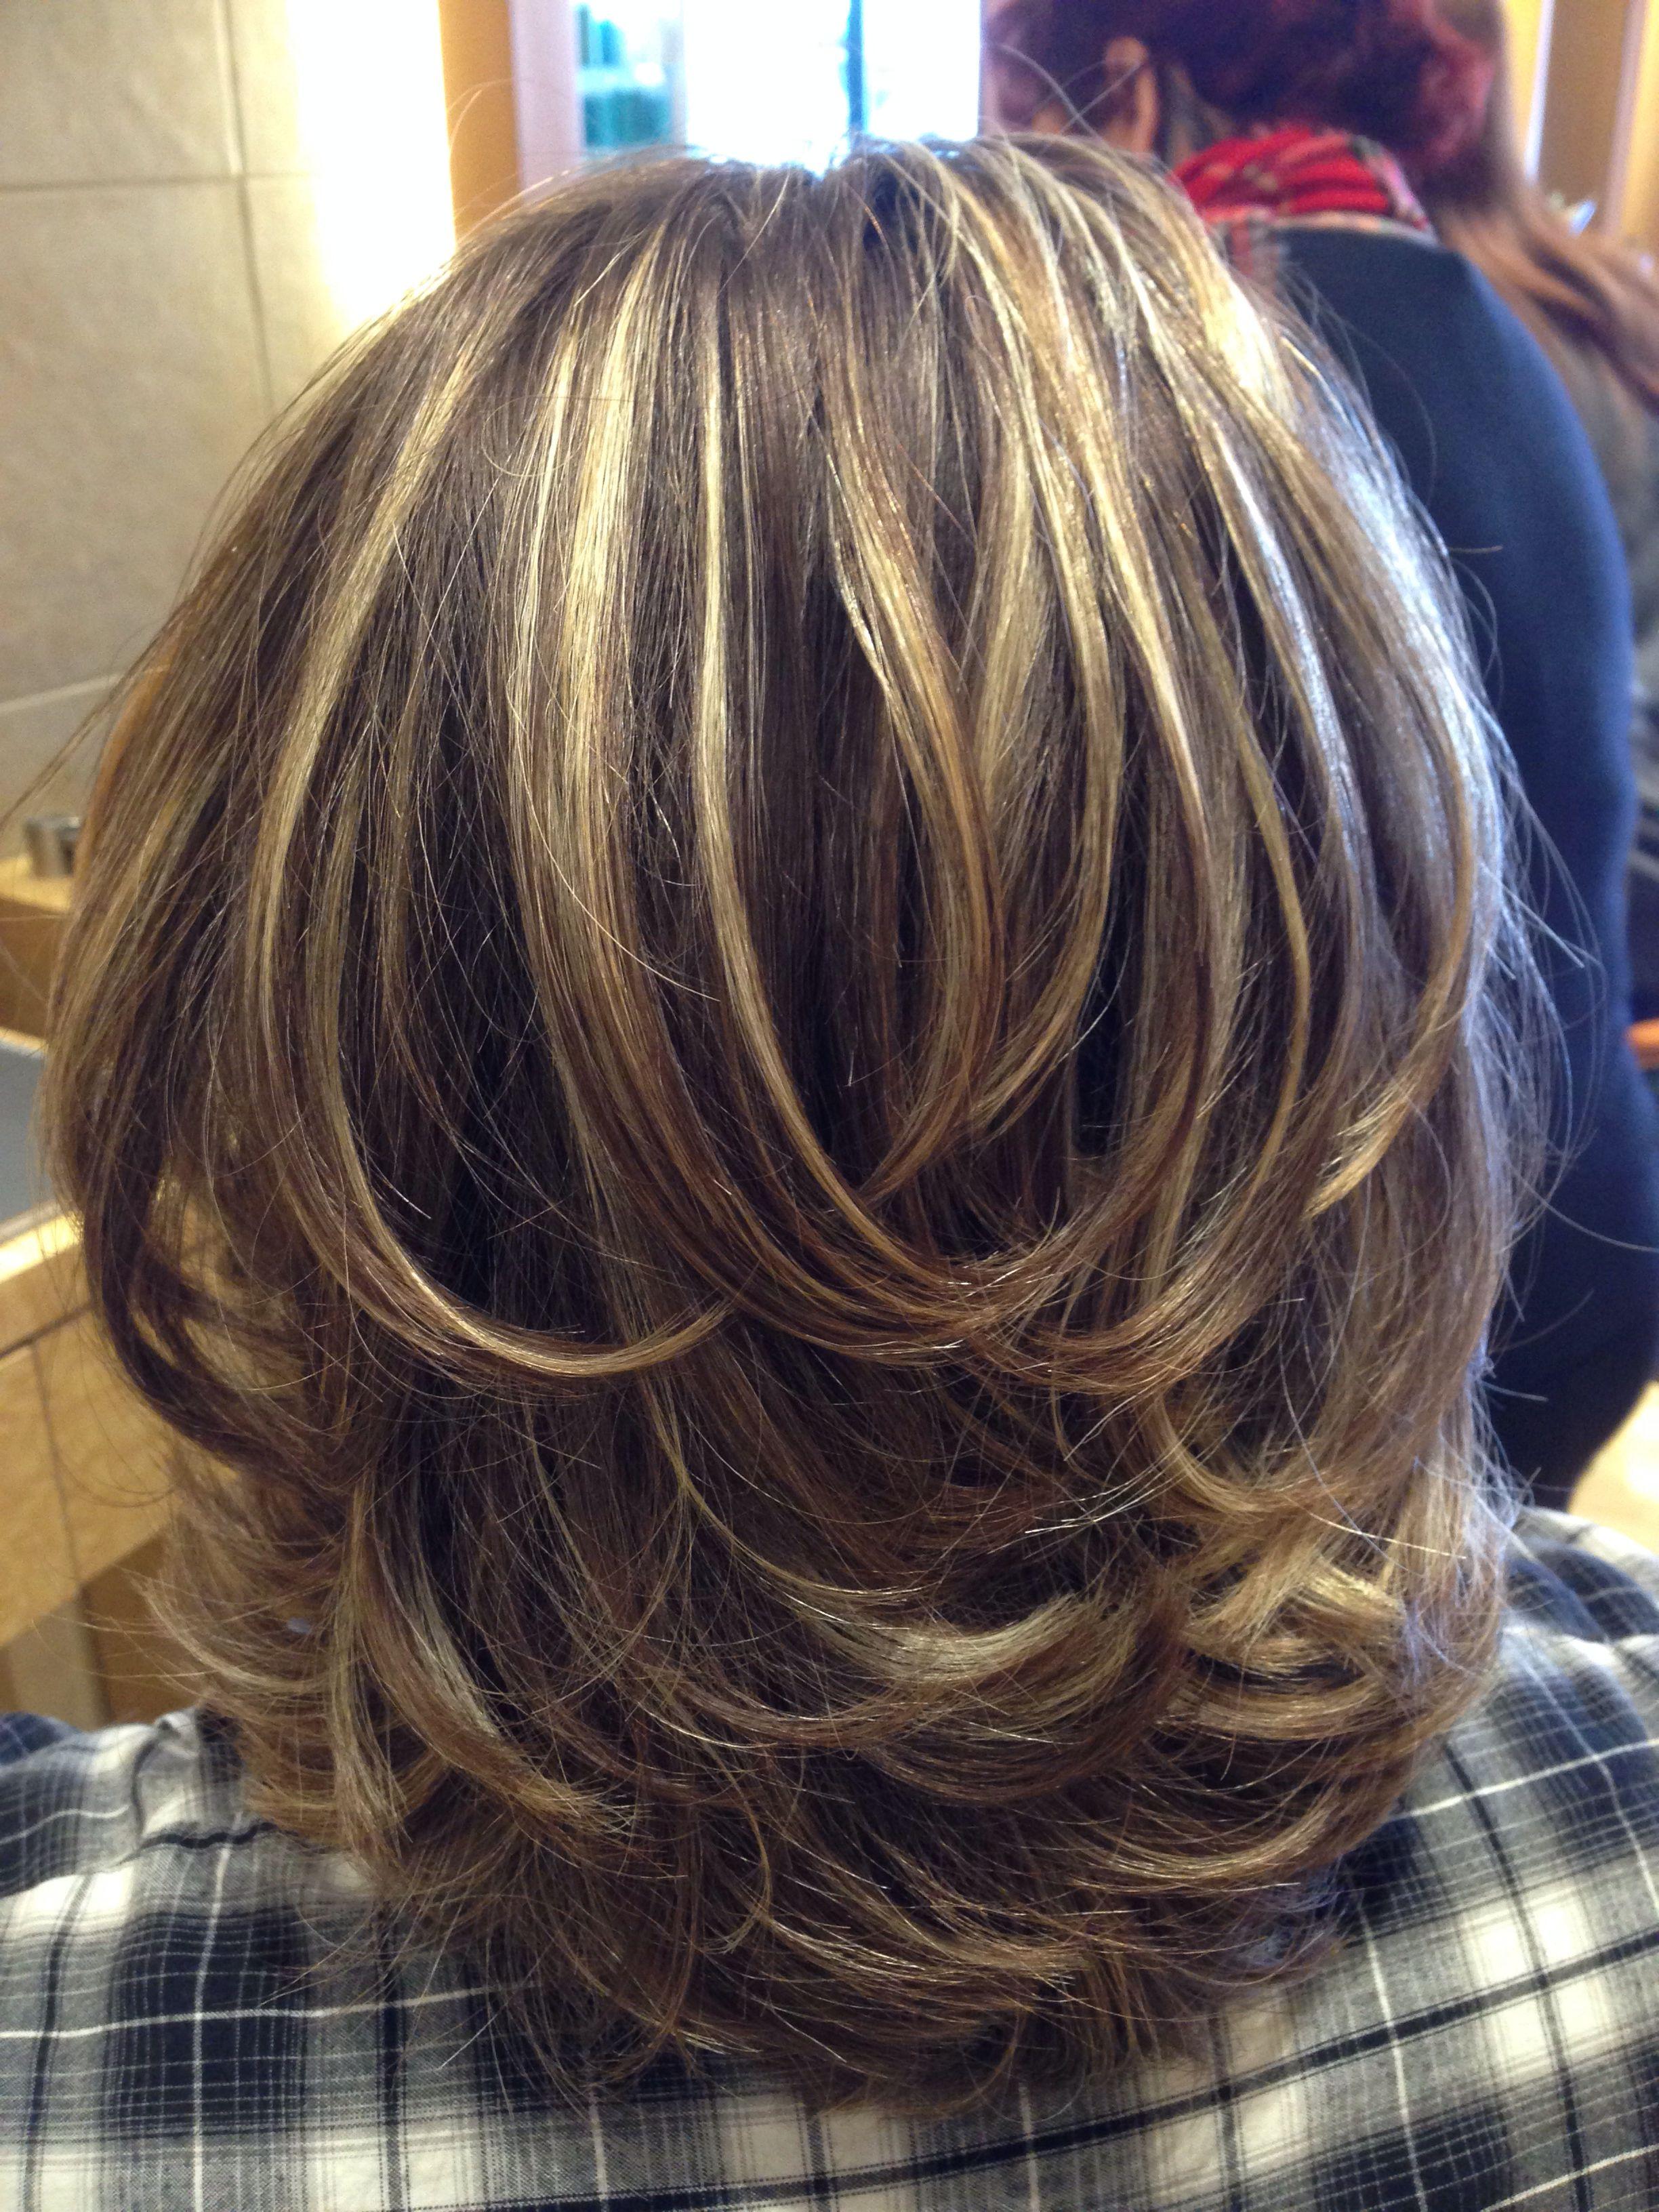 Hair Styles, Hair, Hair Cuts Inside Famous Layered Medium Haircuts (View 9 of 20)